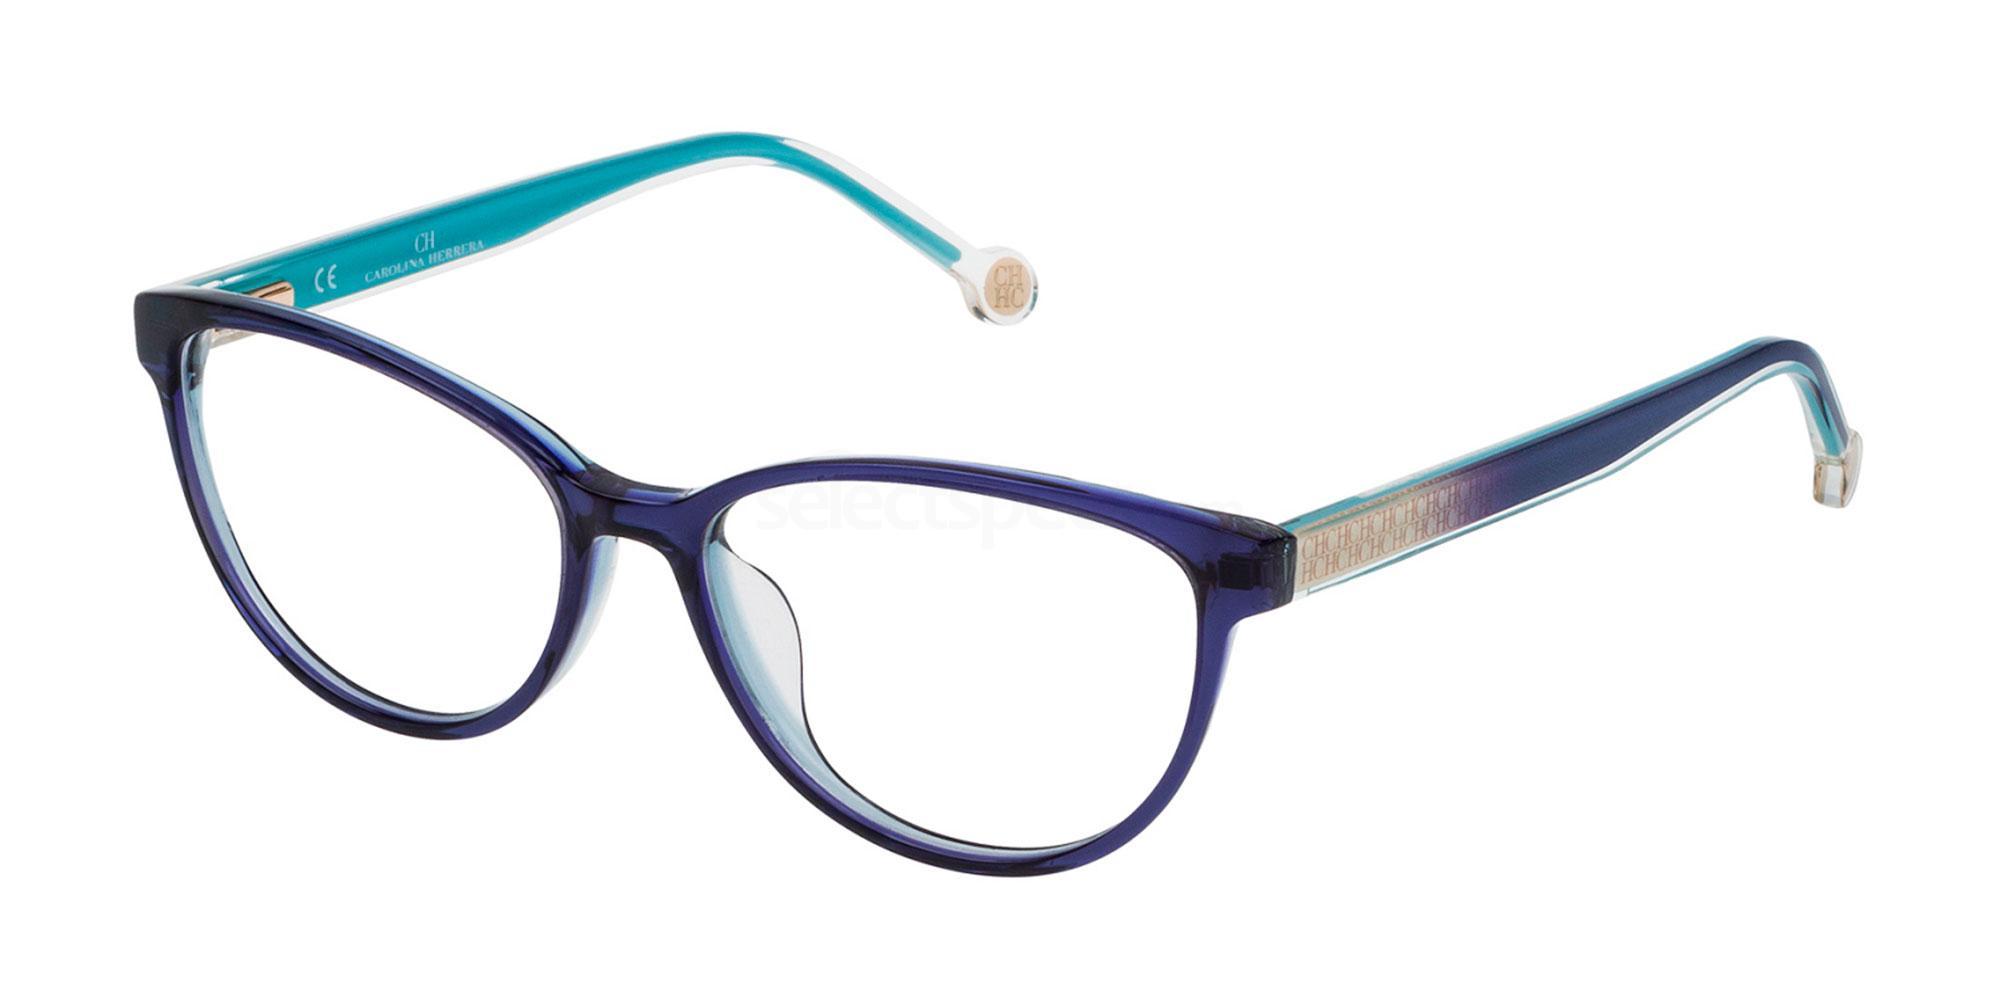 0J62 VHE724 Glasses, CH Carolina Herrera